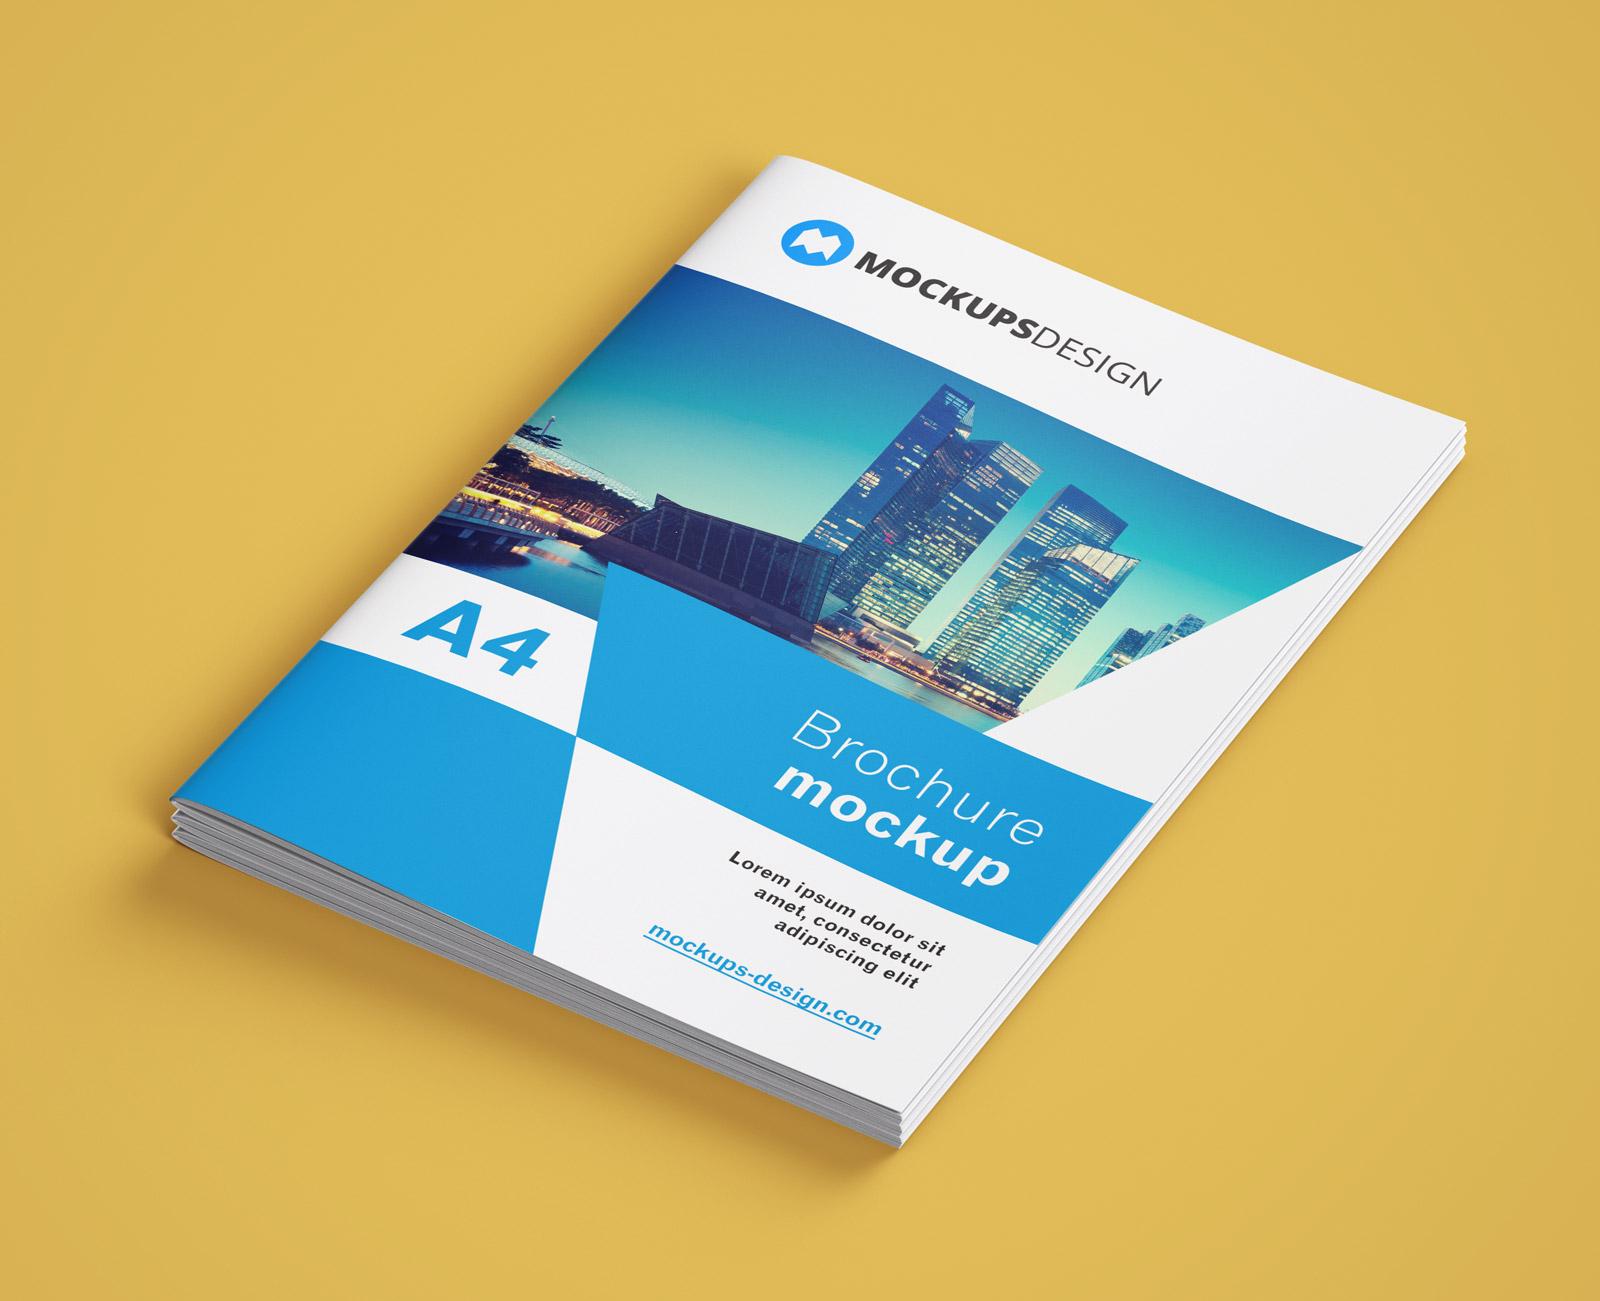 Precision pipes and profiles company news: Free A4 Multi Page Brochure Company Profile Mockup Psd Set Good Mockups